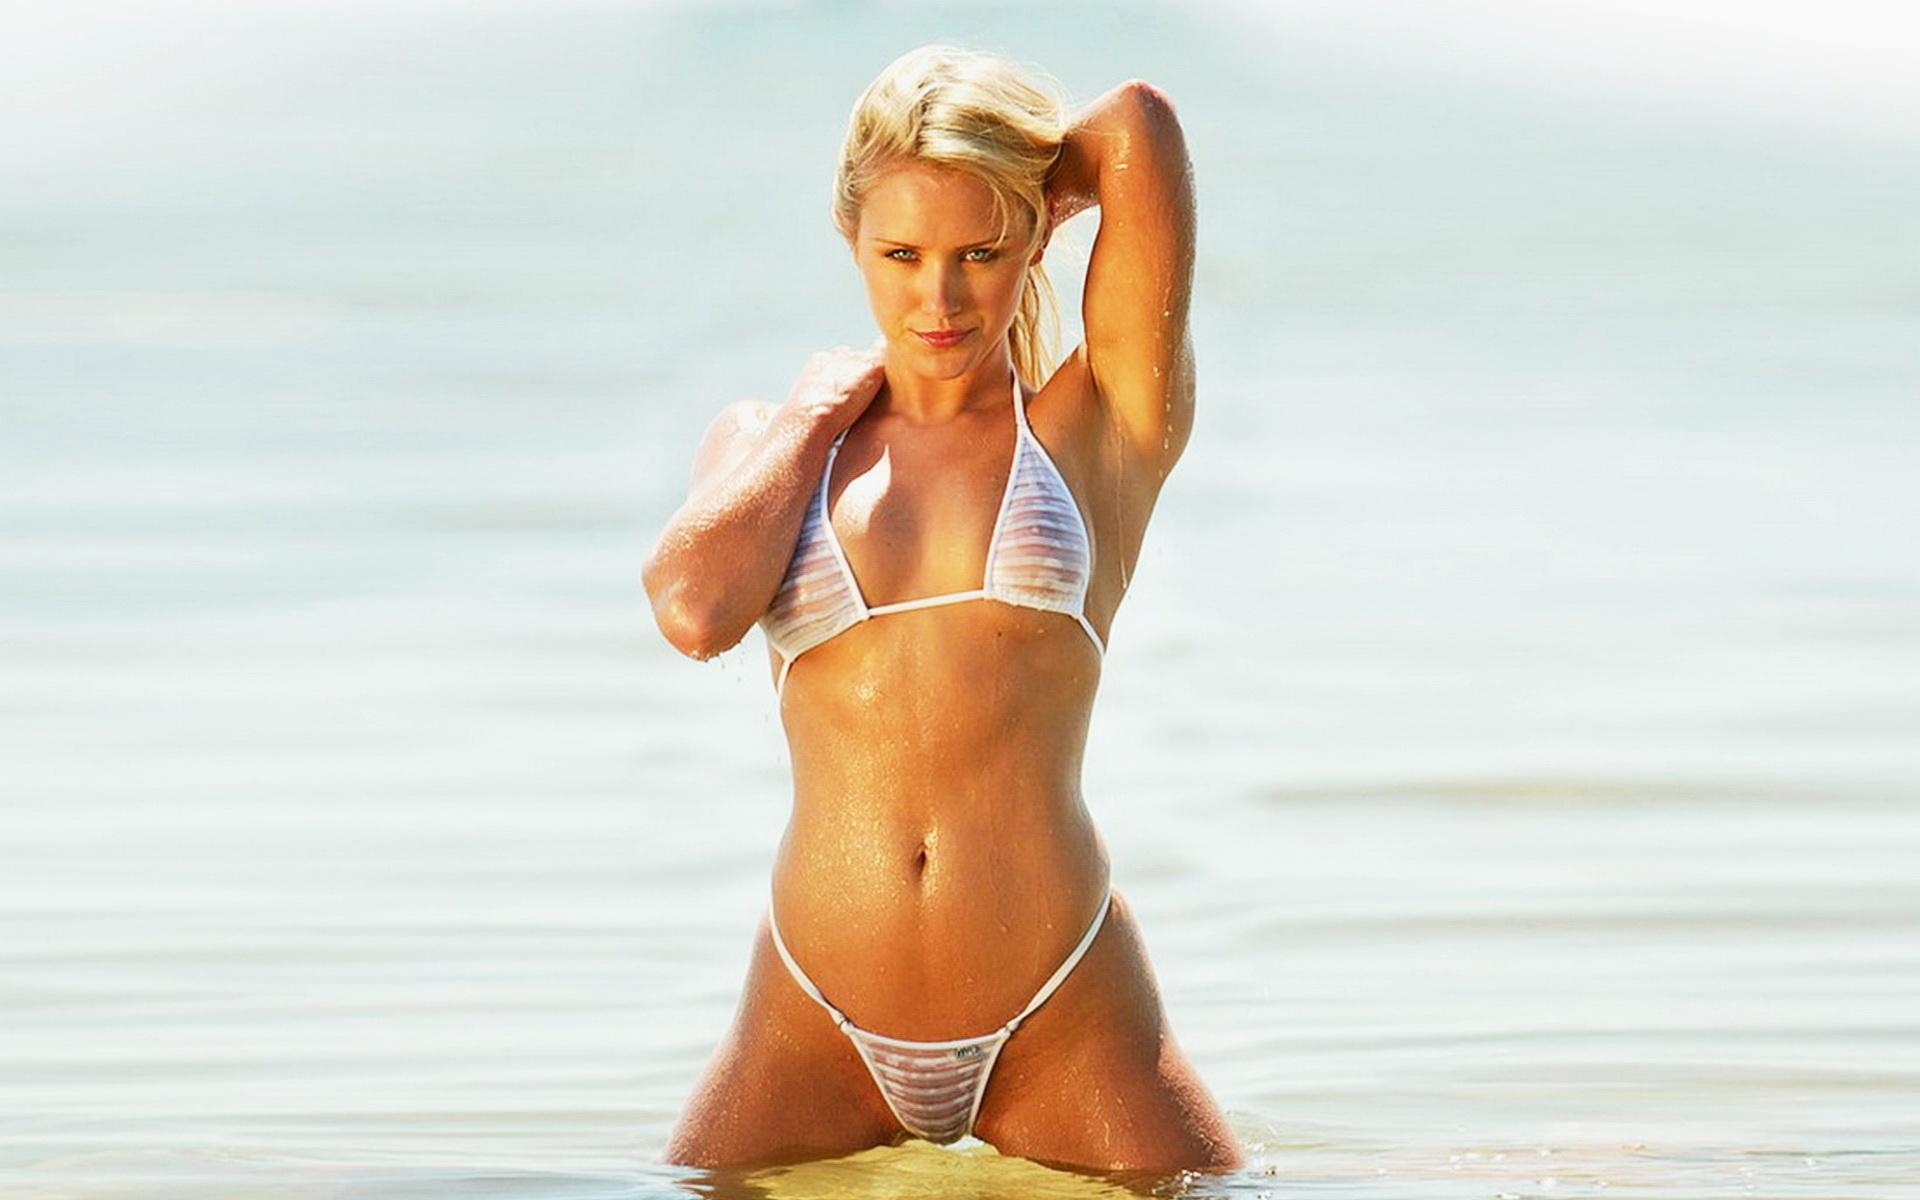 Фото пляж микро бикини 21 фотография